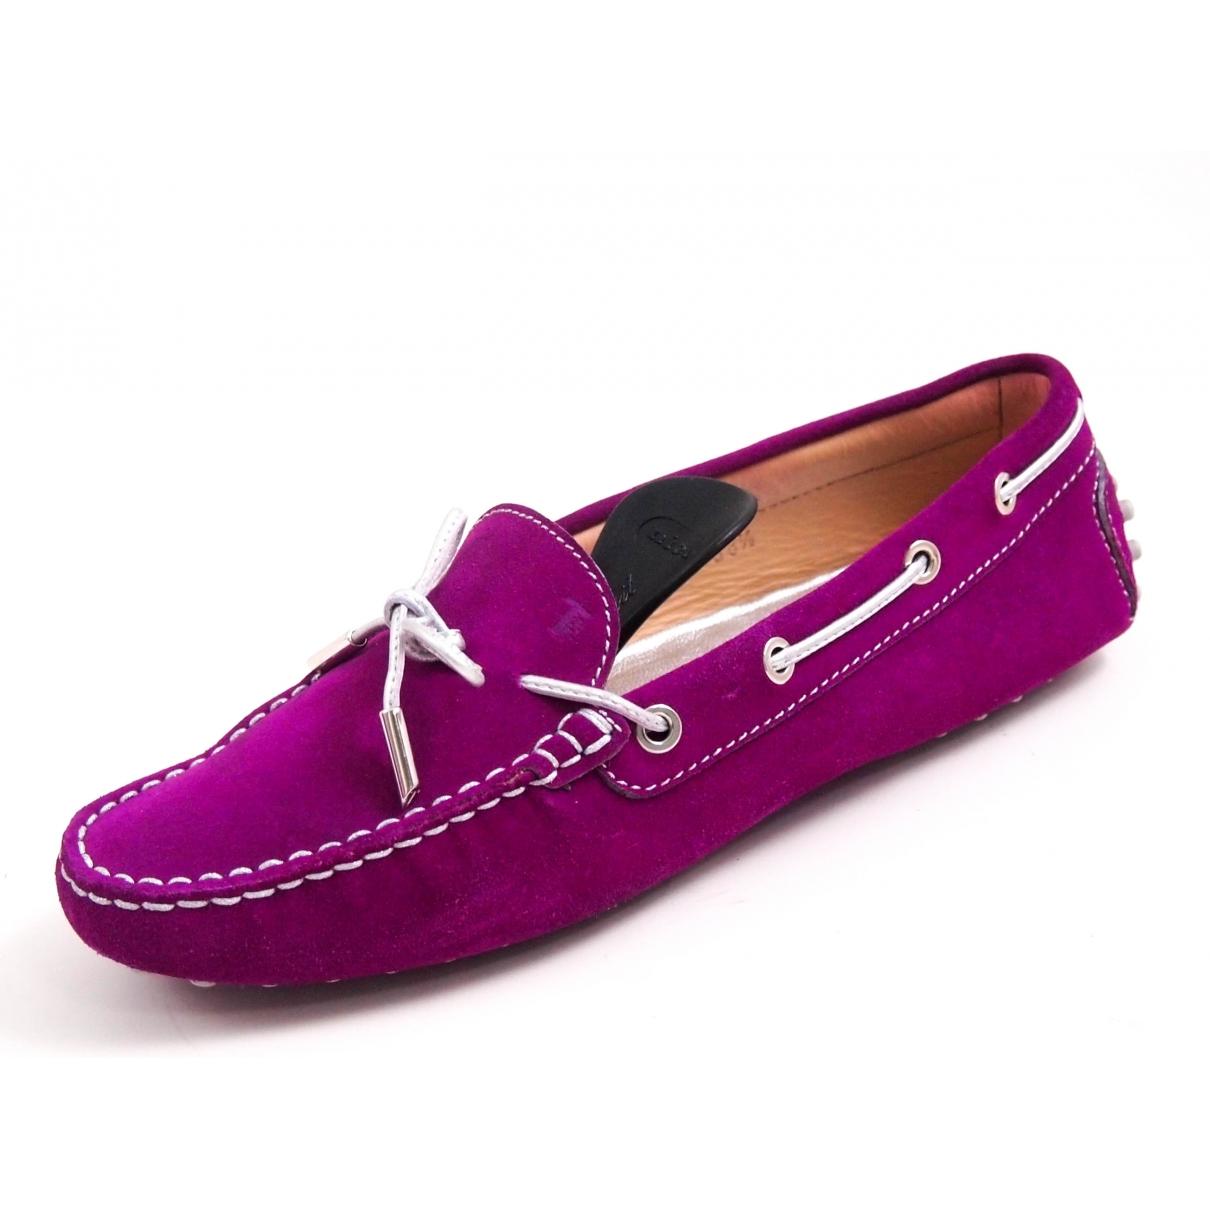 Tod's Gommino Purple Suede Flats for Women 38.5 EU